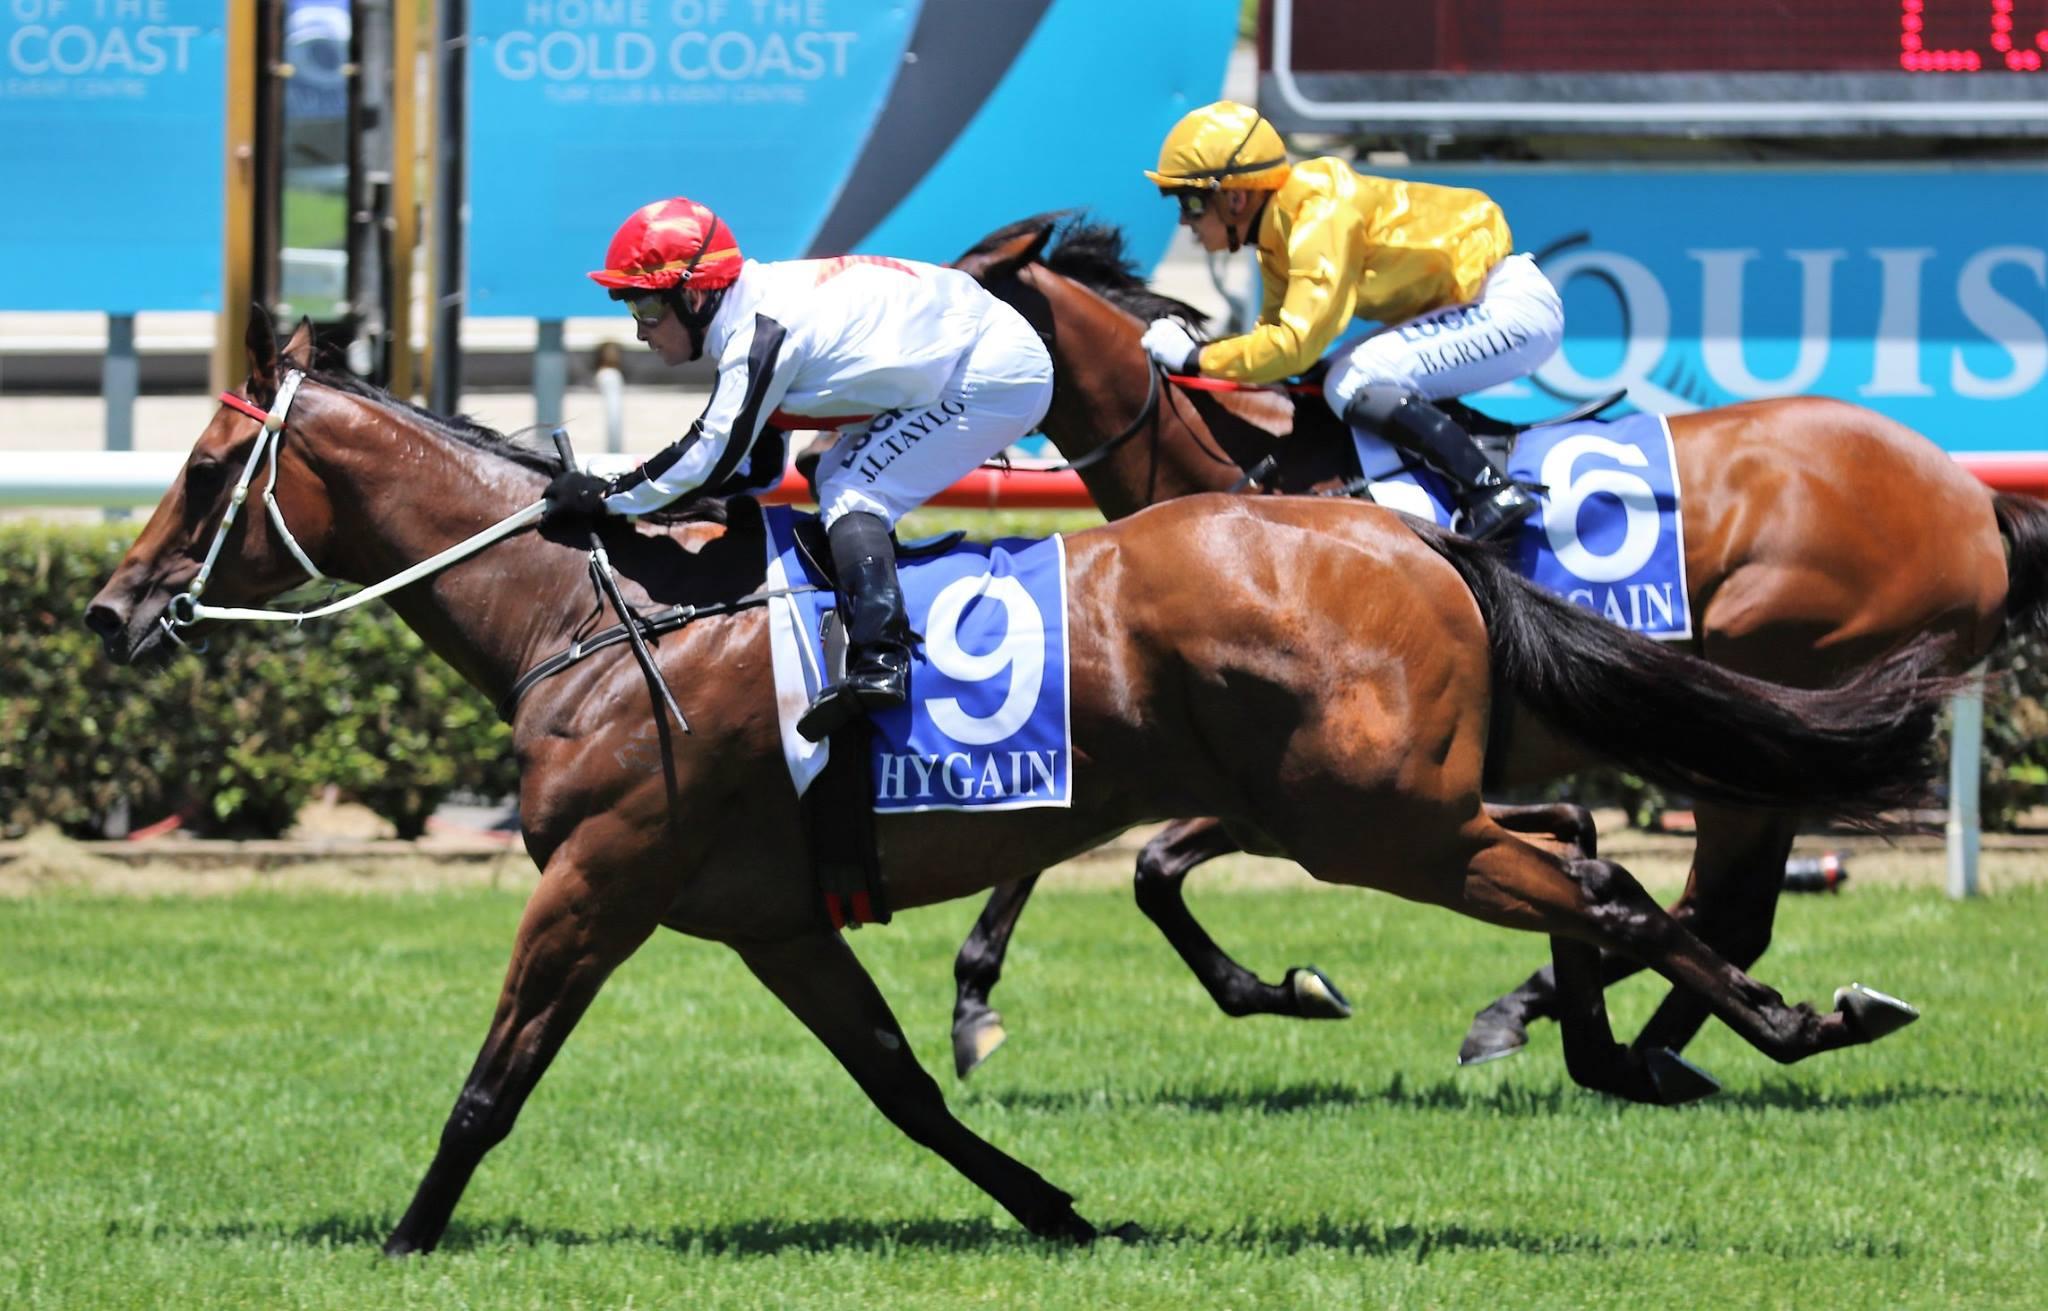 Gold Coast upset winner Licitra